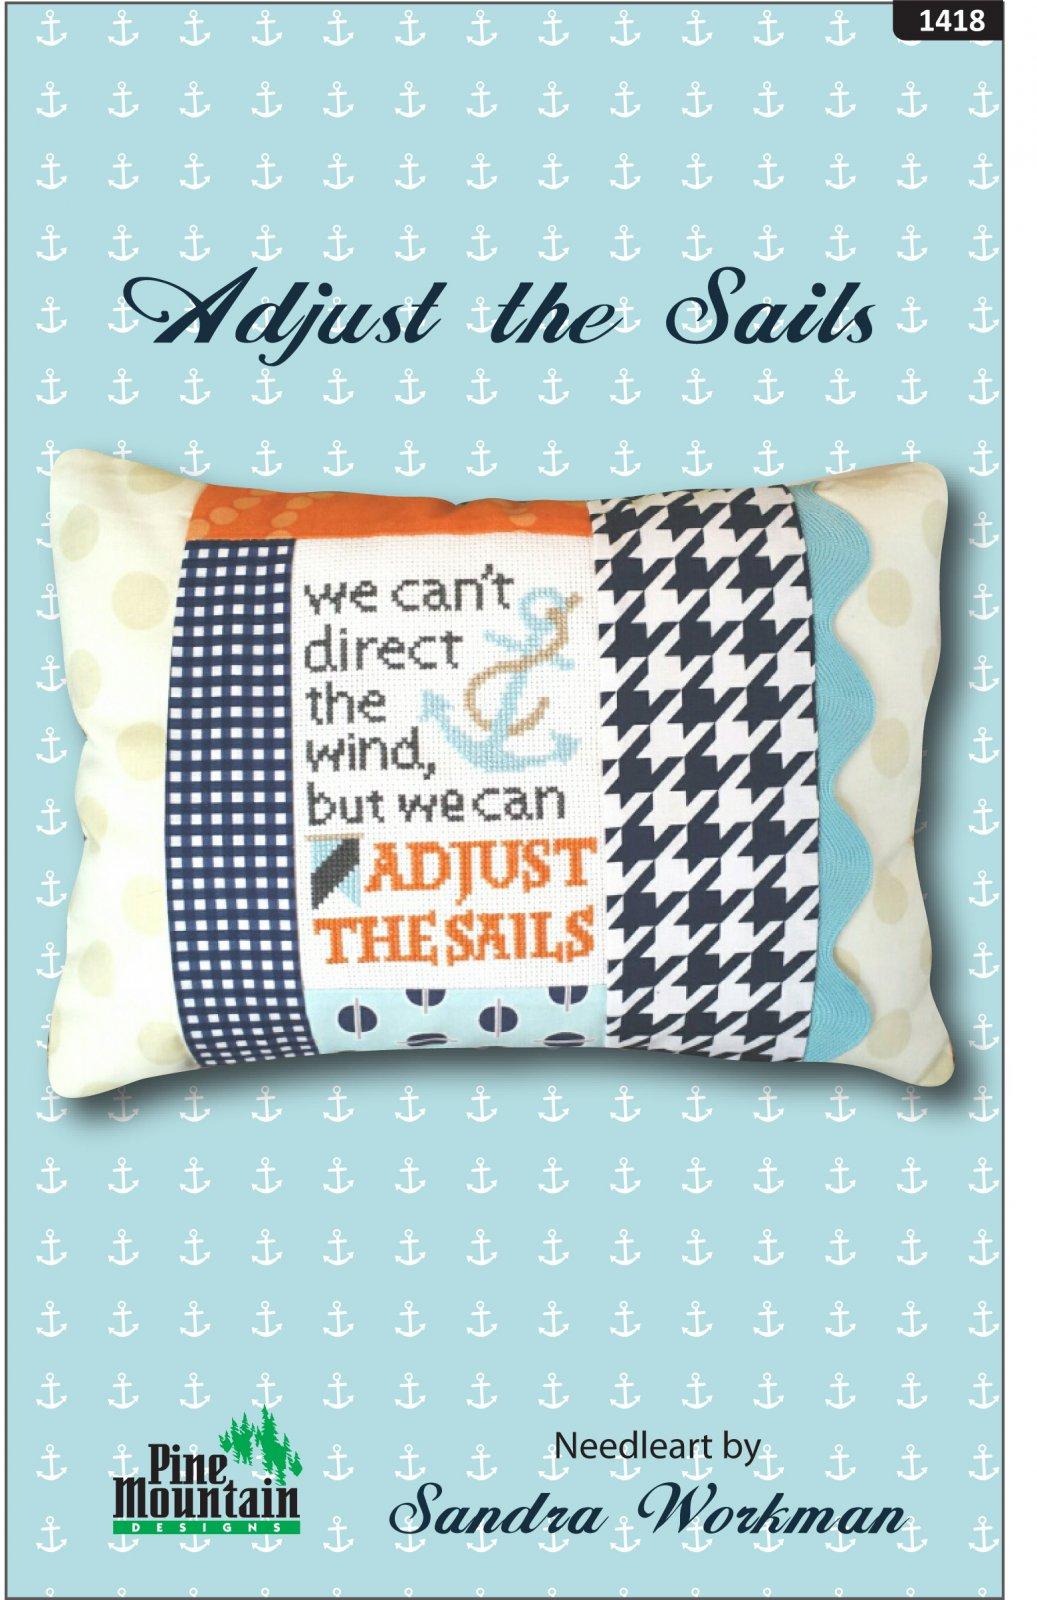 Adjust the Sails - Words of Wisdom 1418